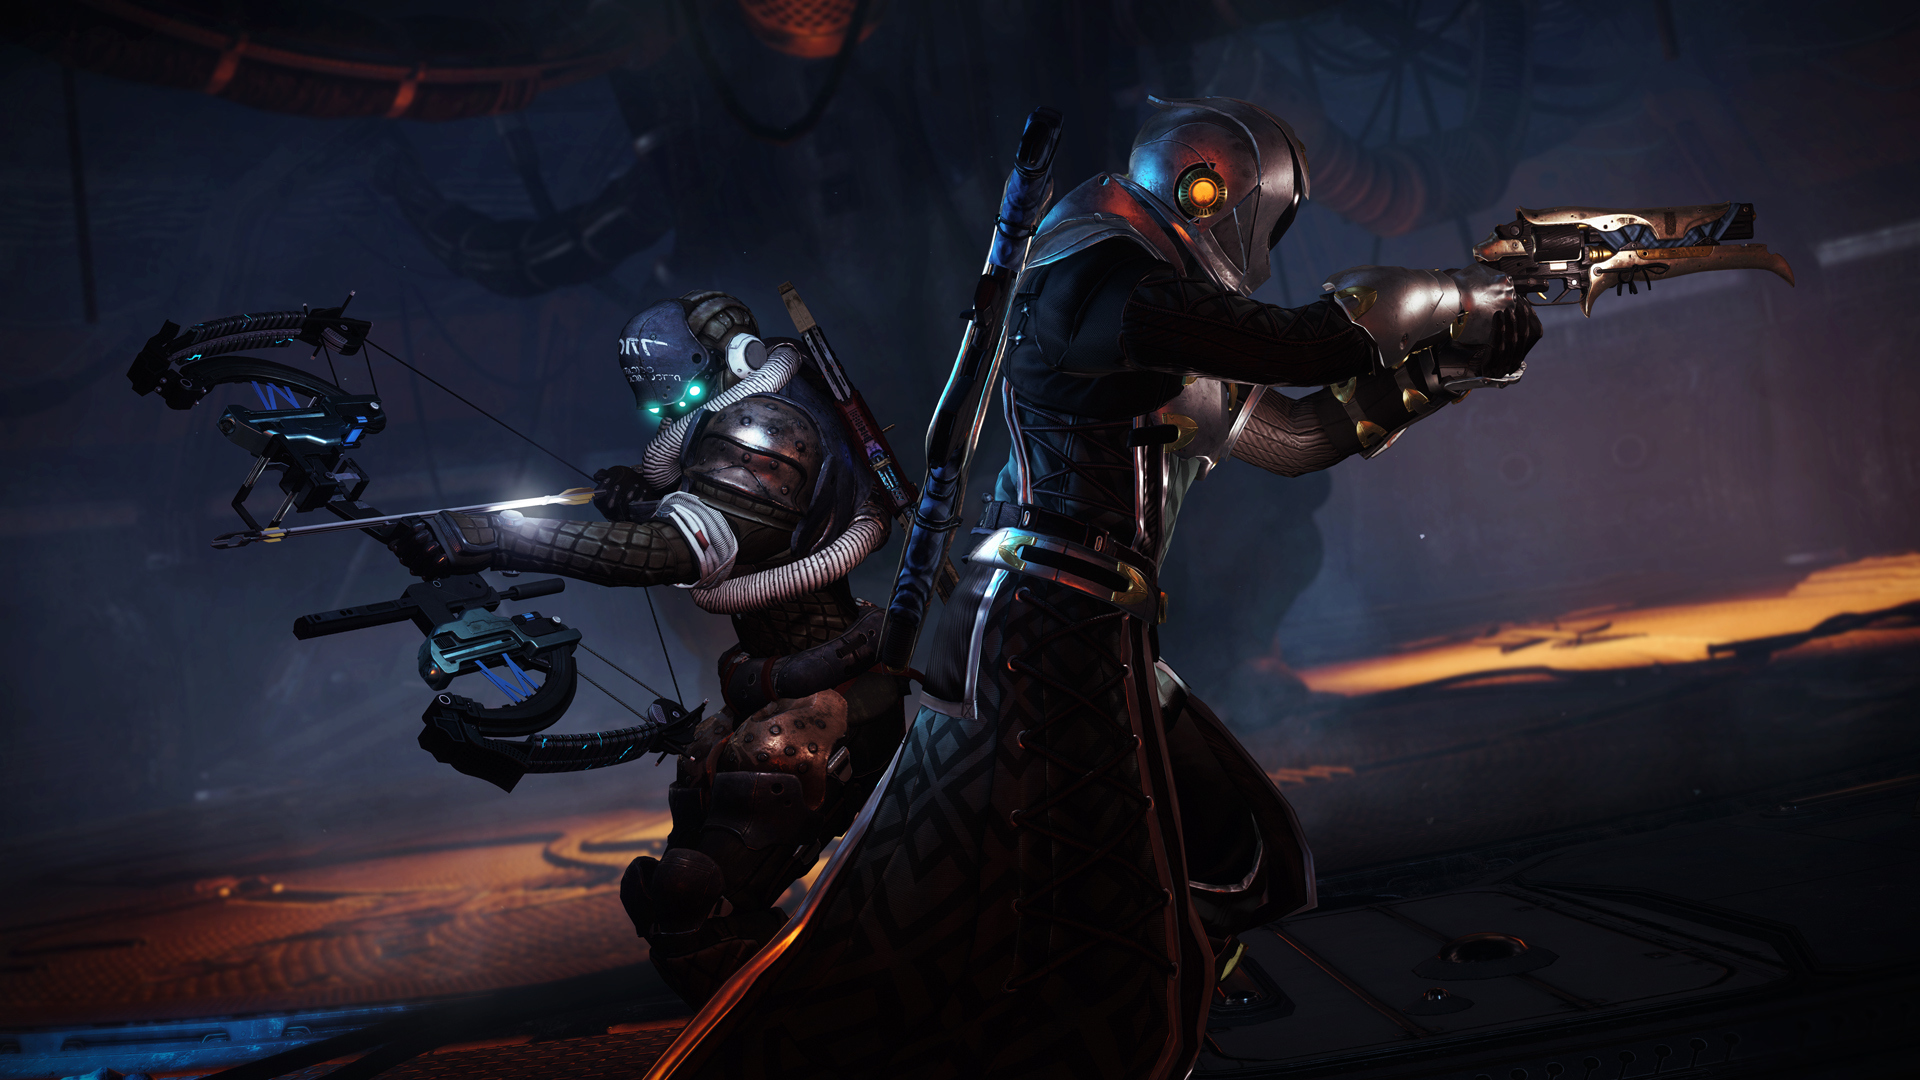 Titan Warlock Destiny 2 Forsaken Wallpaper Hd Games 4k Wallpapers